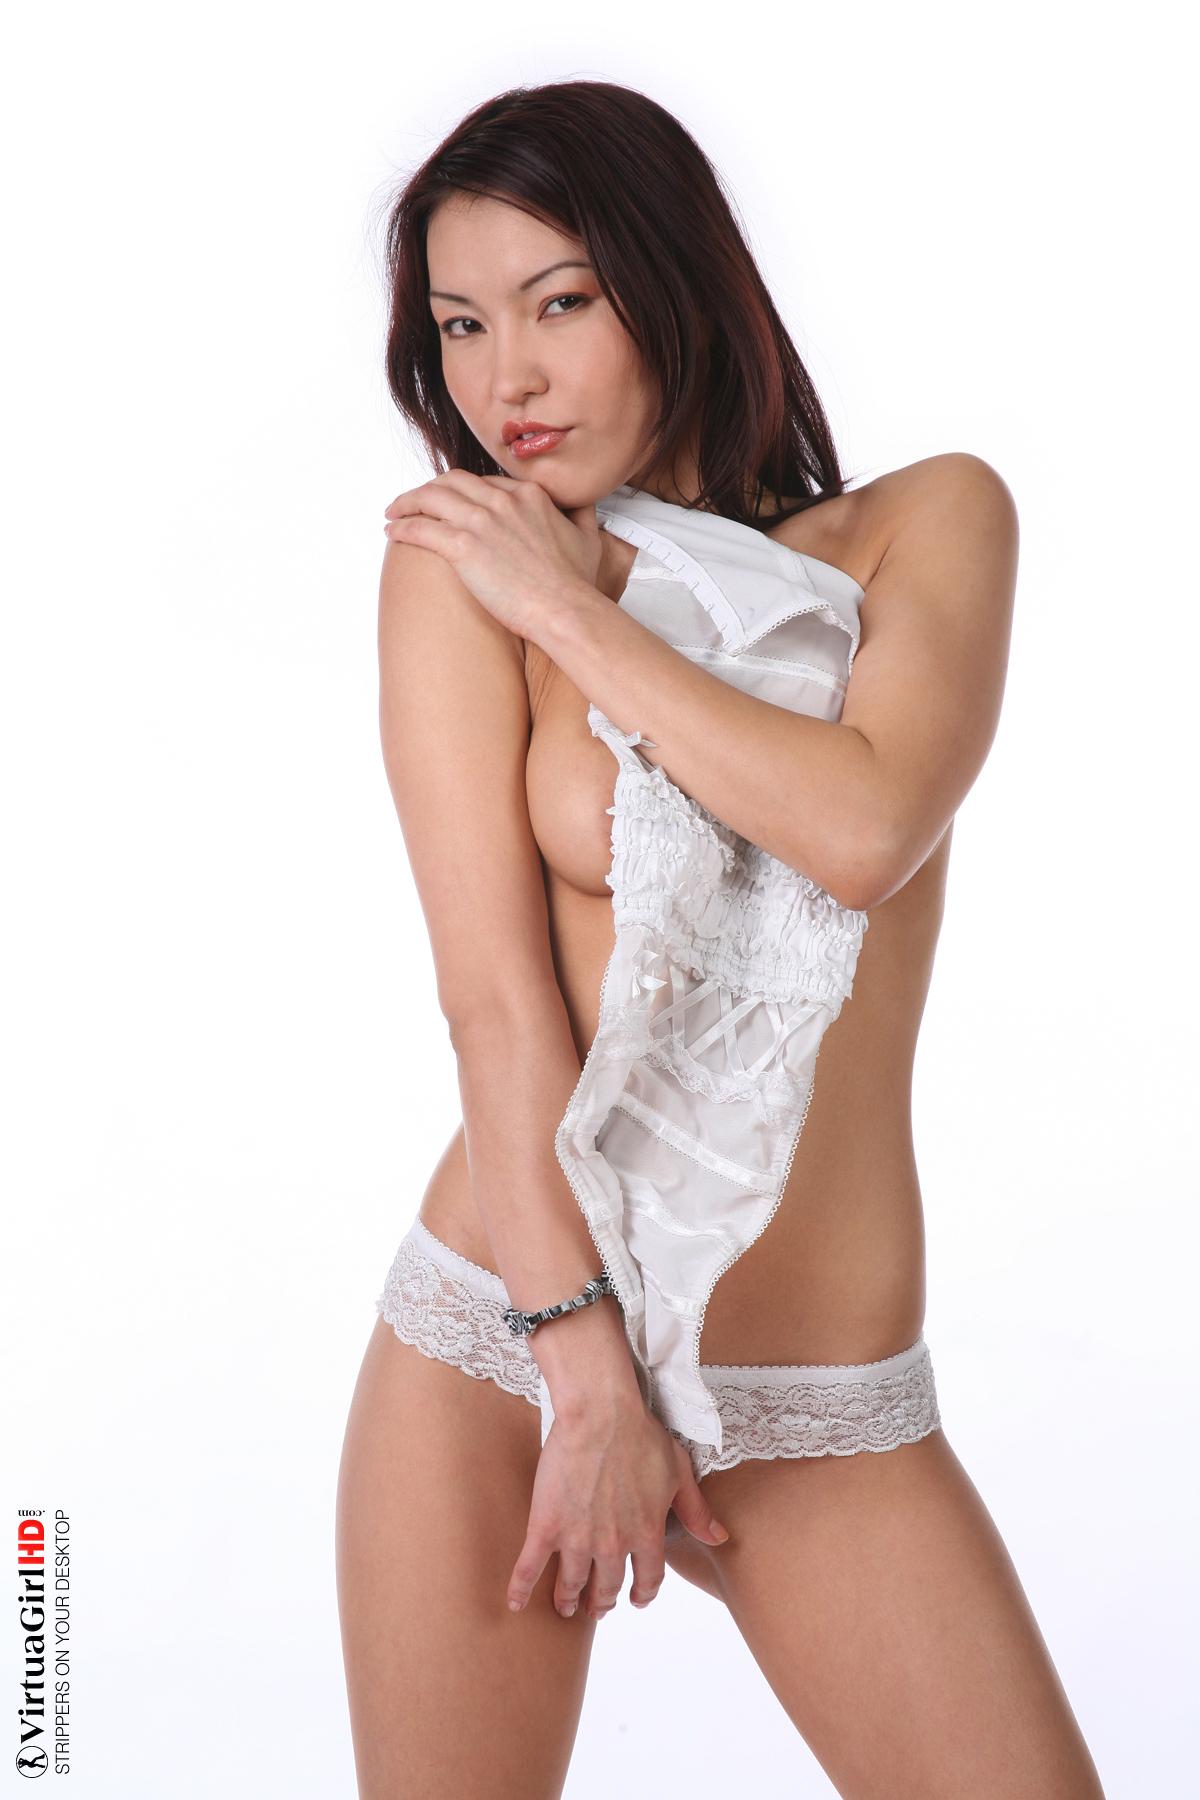 stripper 4 you desktop